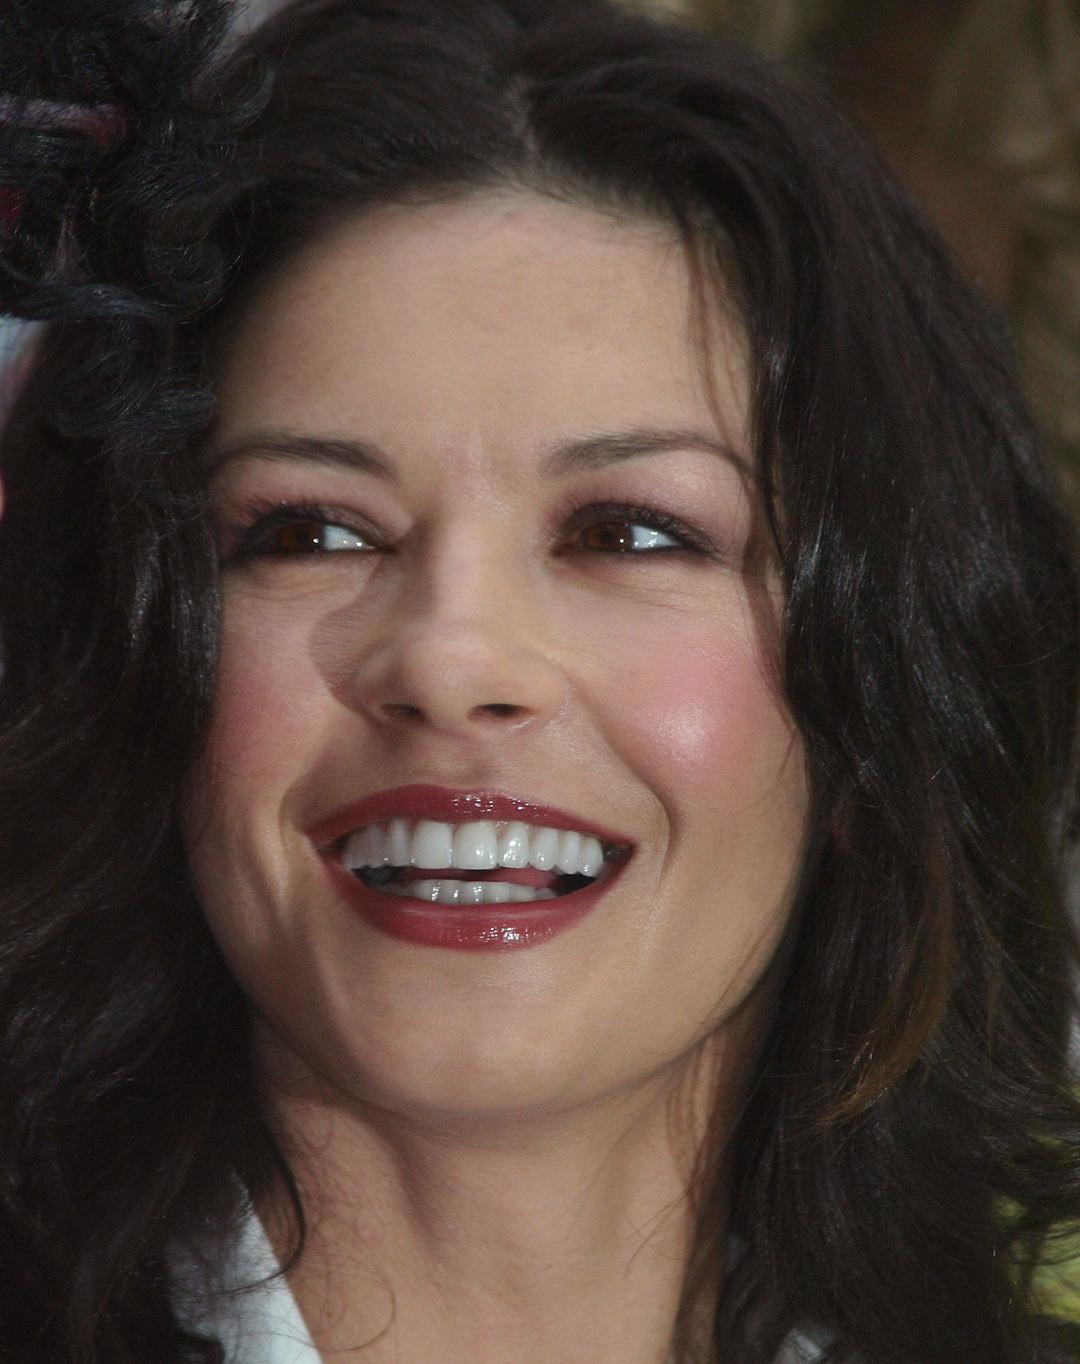 Catherine Zeta Jones Teeth Photo Sheclick Com